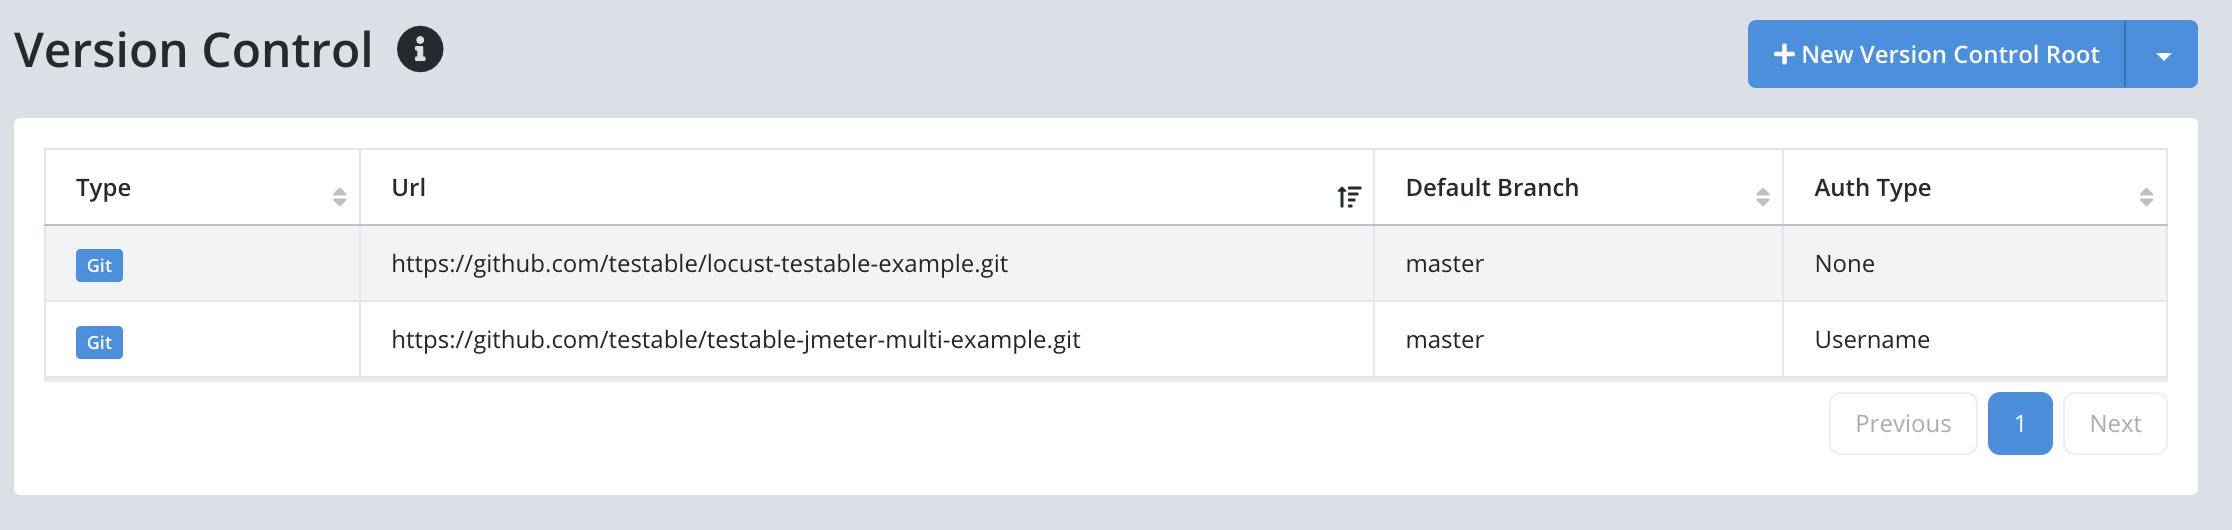 Version Control - Testable